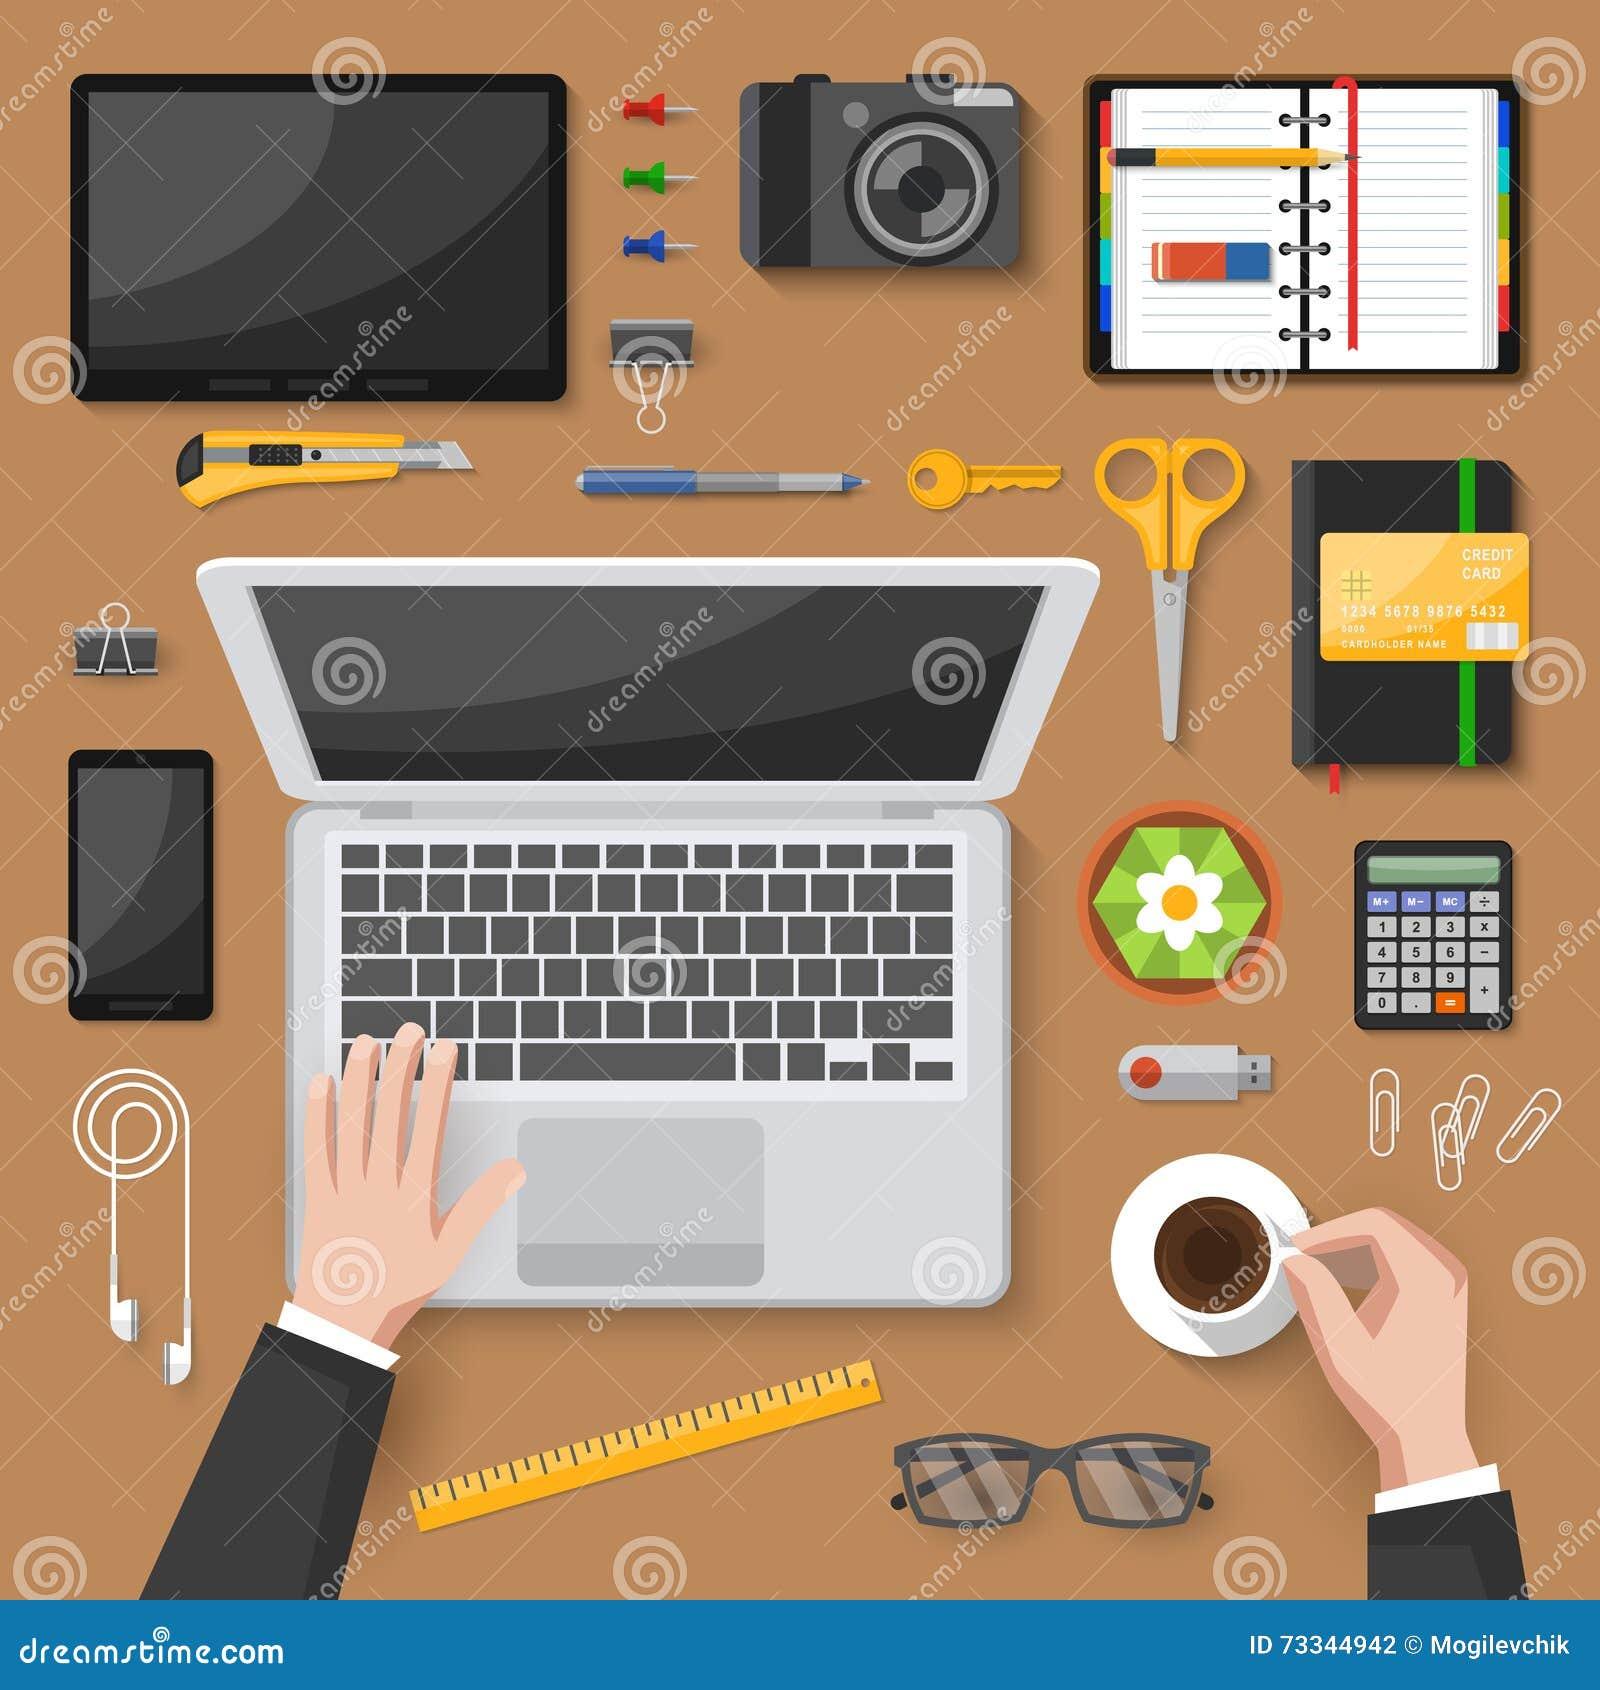 Office Desk Wallpaper: Office Desk Top View Design Stock Vector